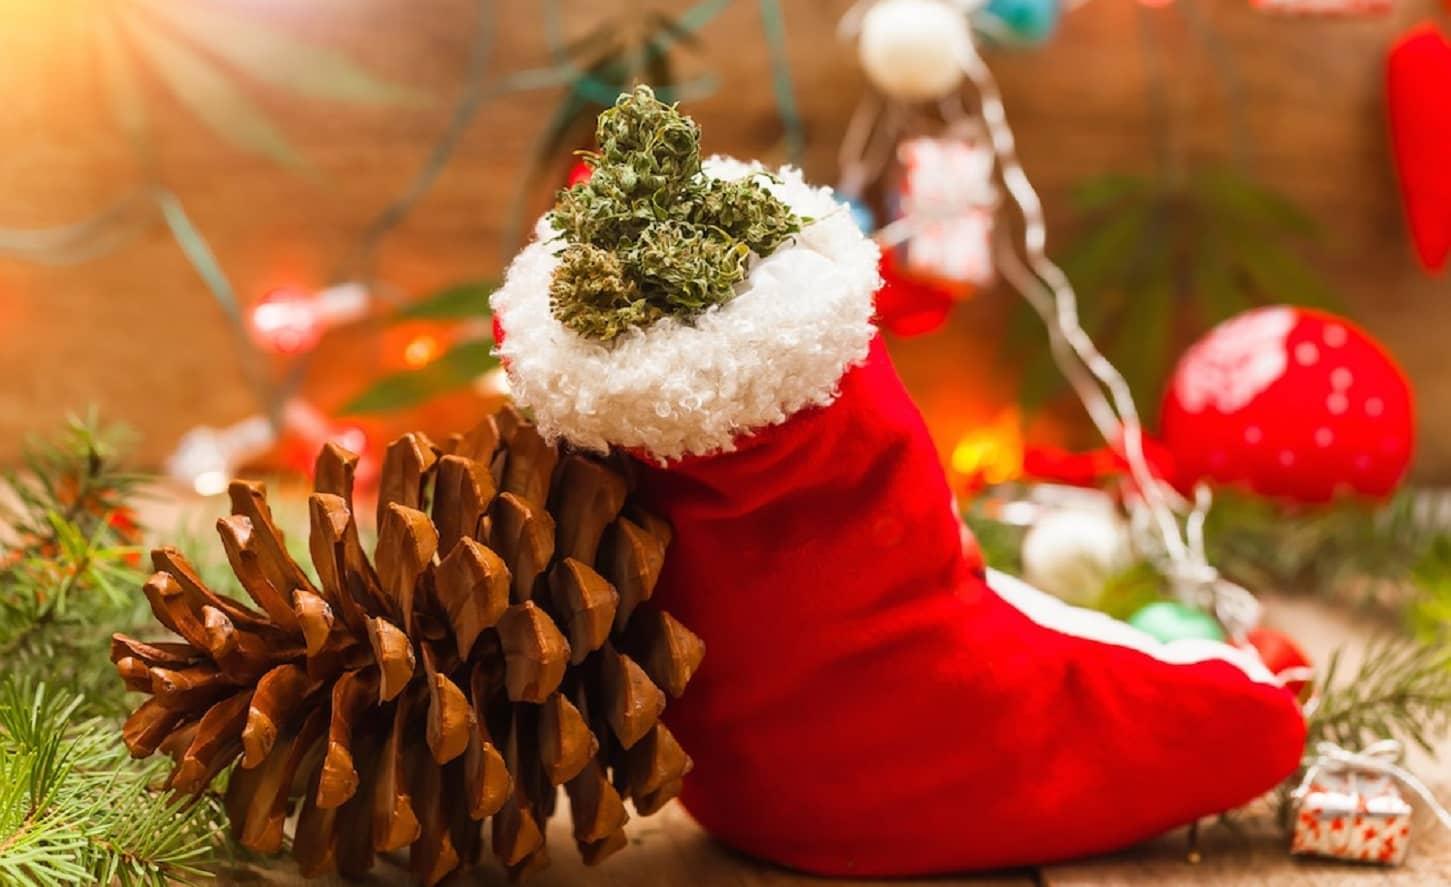 marijuana in a stocking at christmas